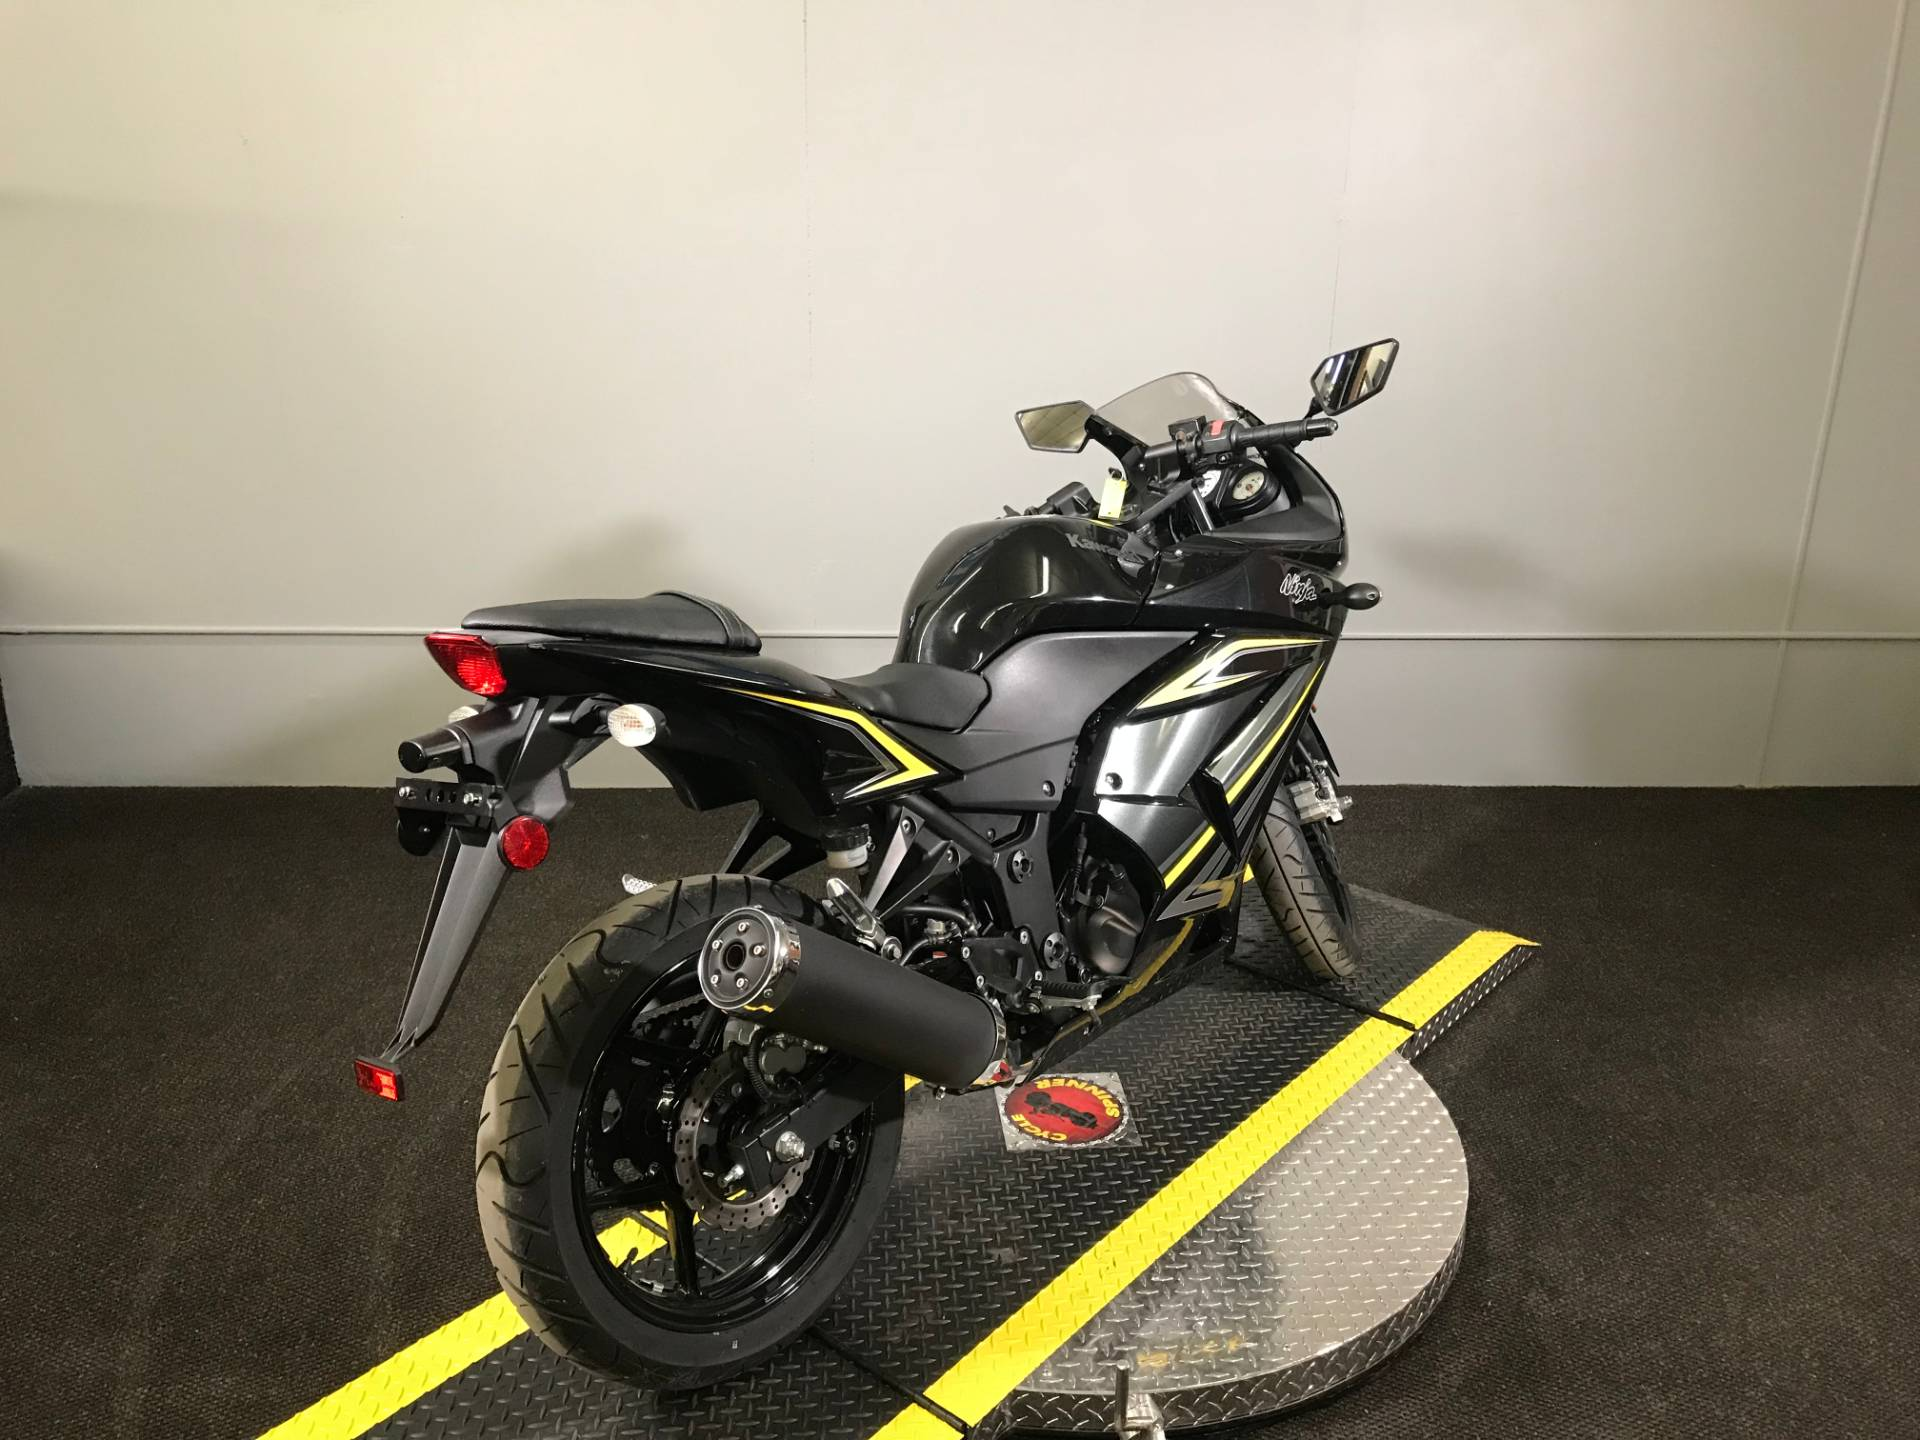 2012 Kawasaki Ninja 250r In Tyrone Pennsylvania